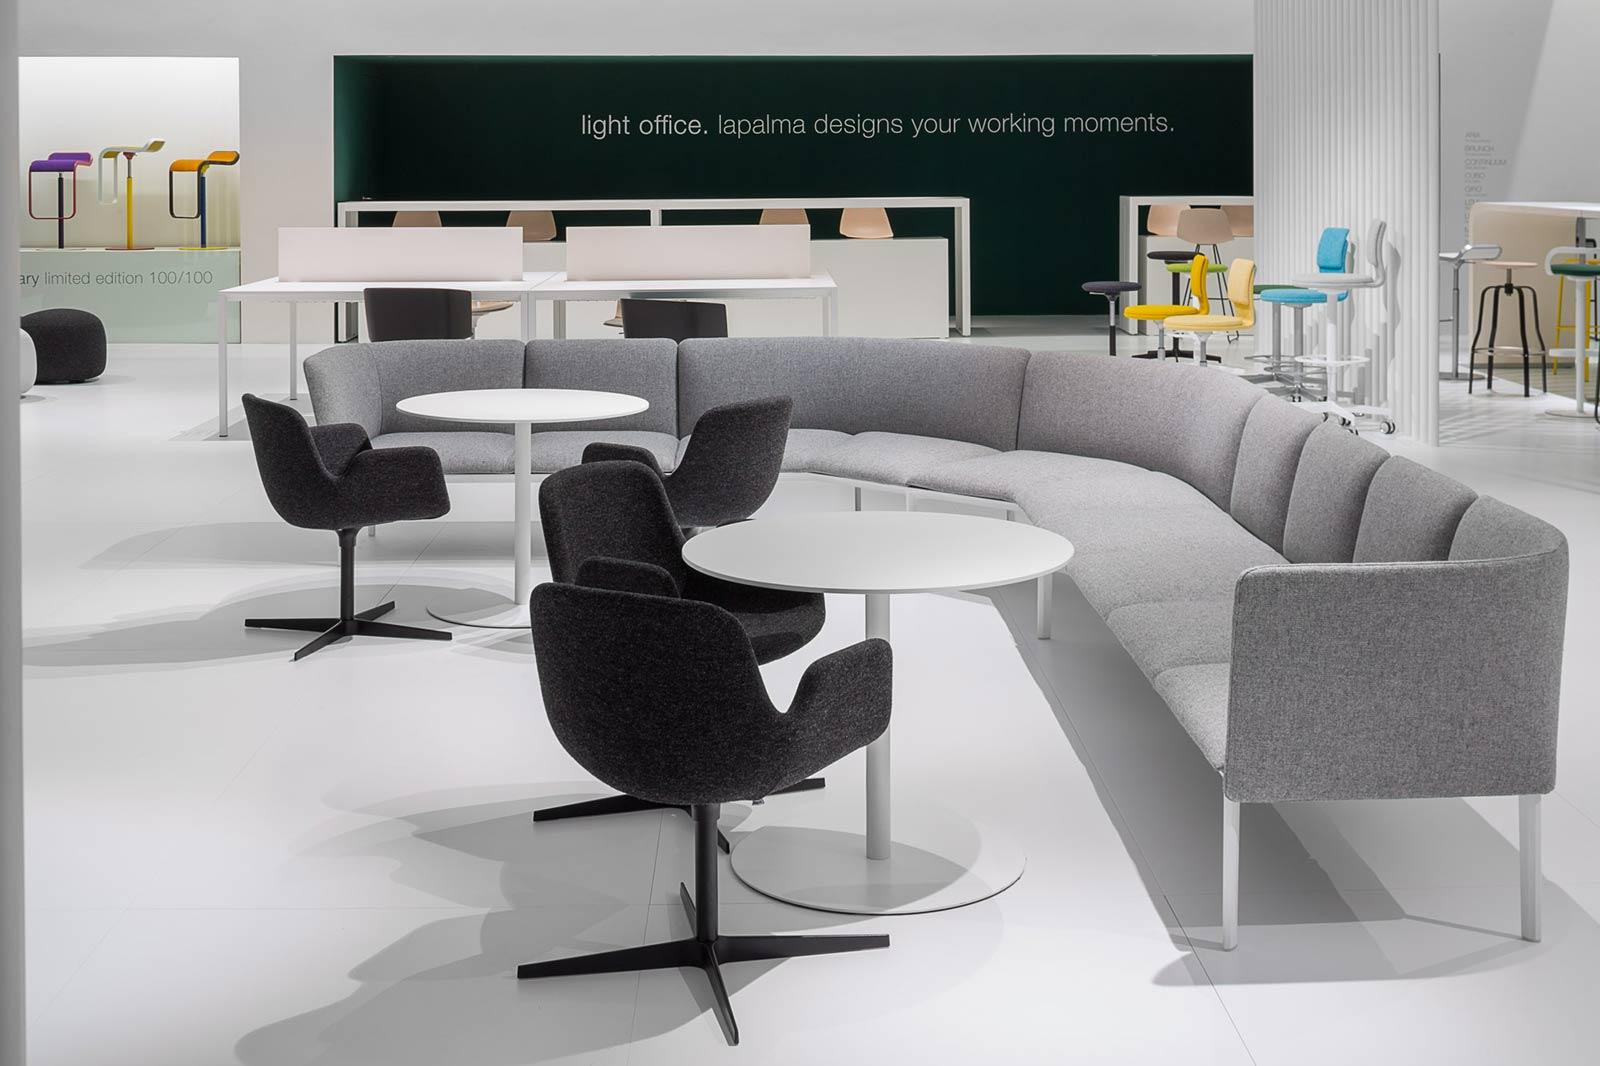 Exhibition Stand Rota : Francesco rota exhibition designed for lapalma salone